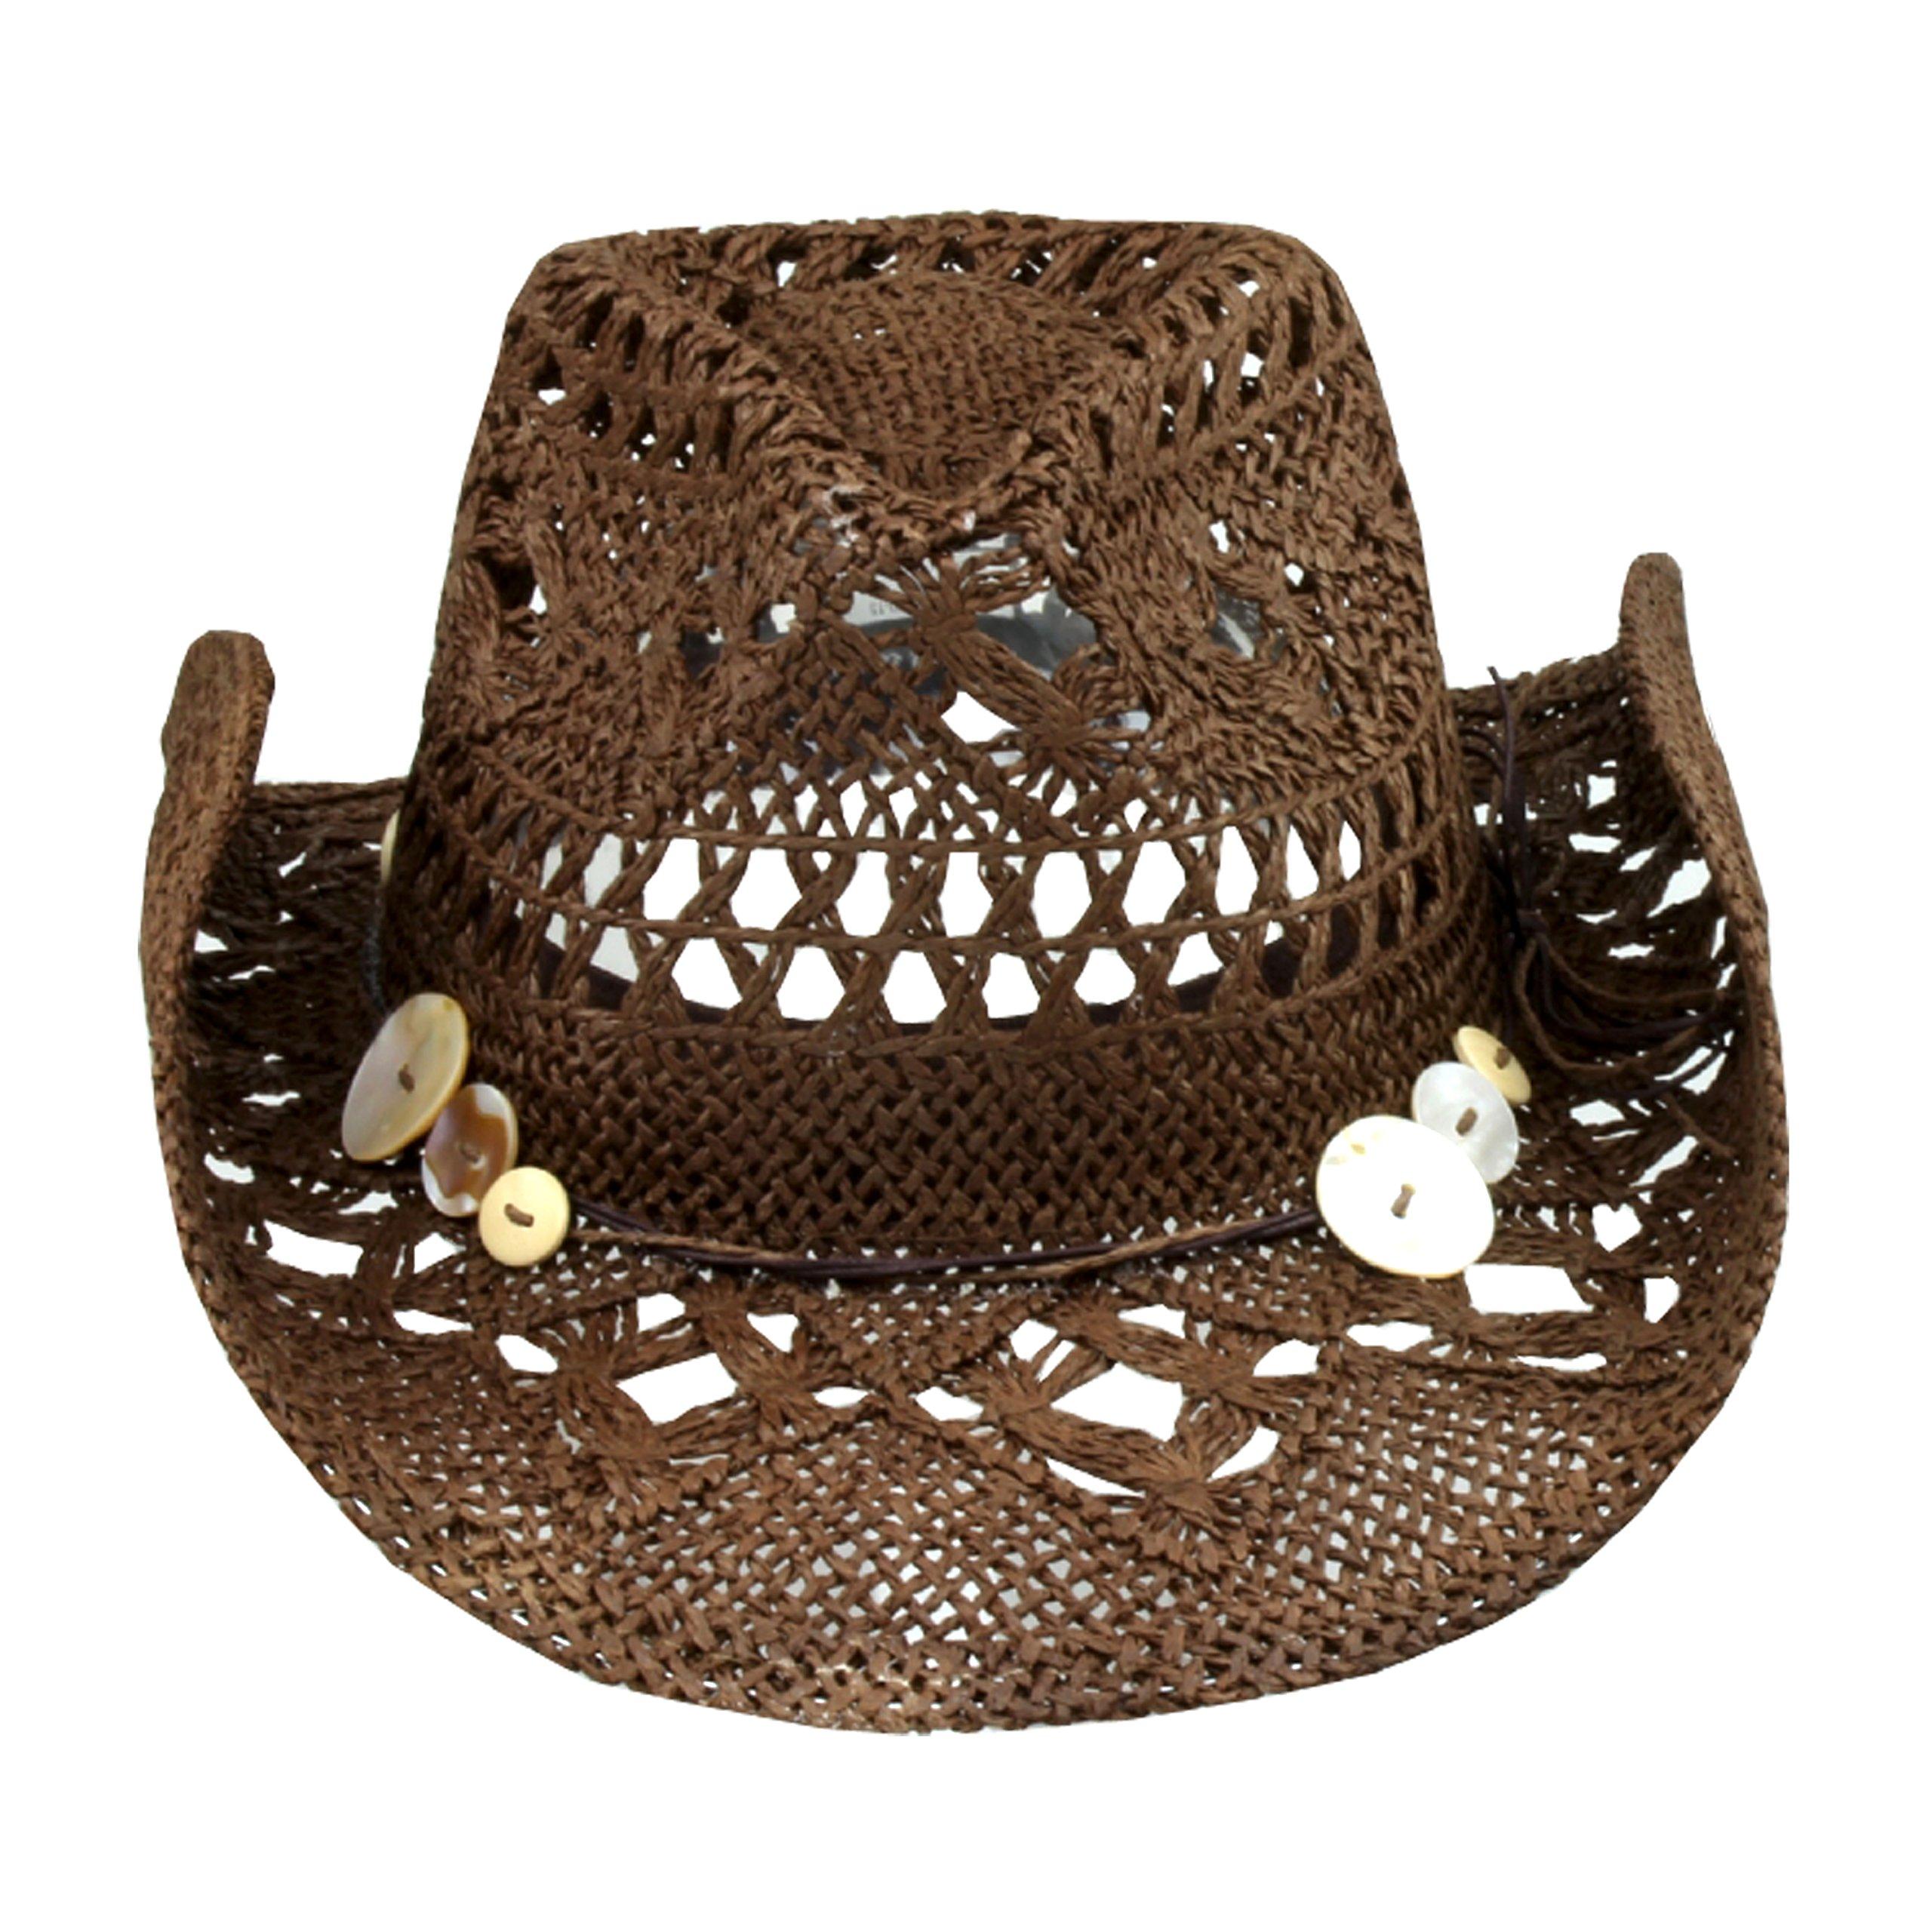 Brown Boho Hip Cowgirl Hat, Lace-Look Straw w/ Raffia Band - Shapeable Brim